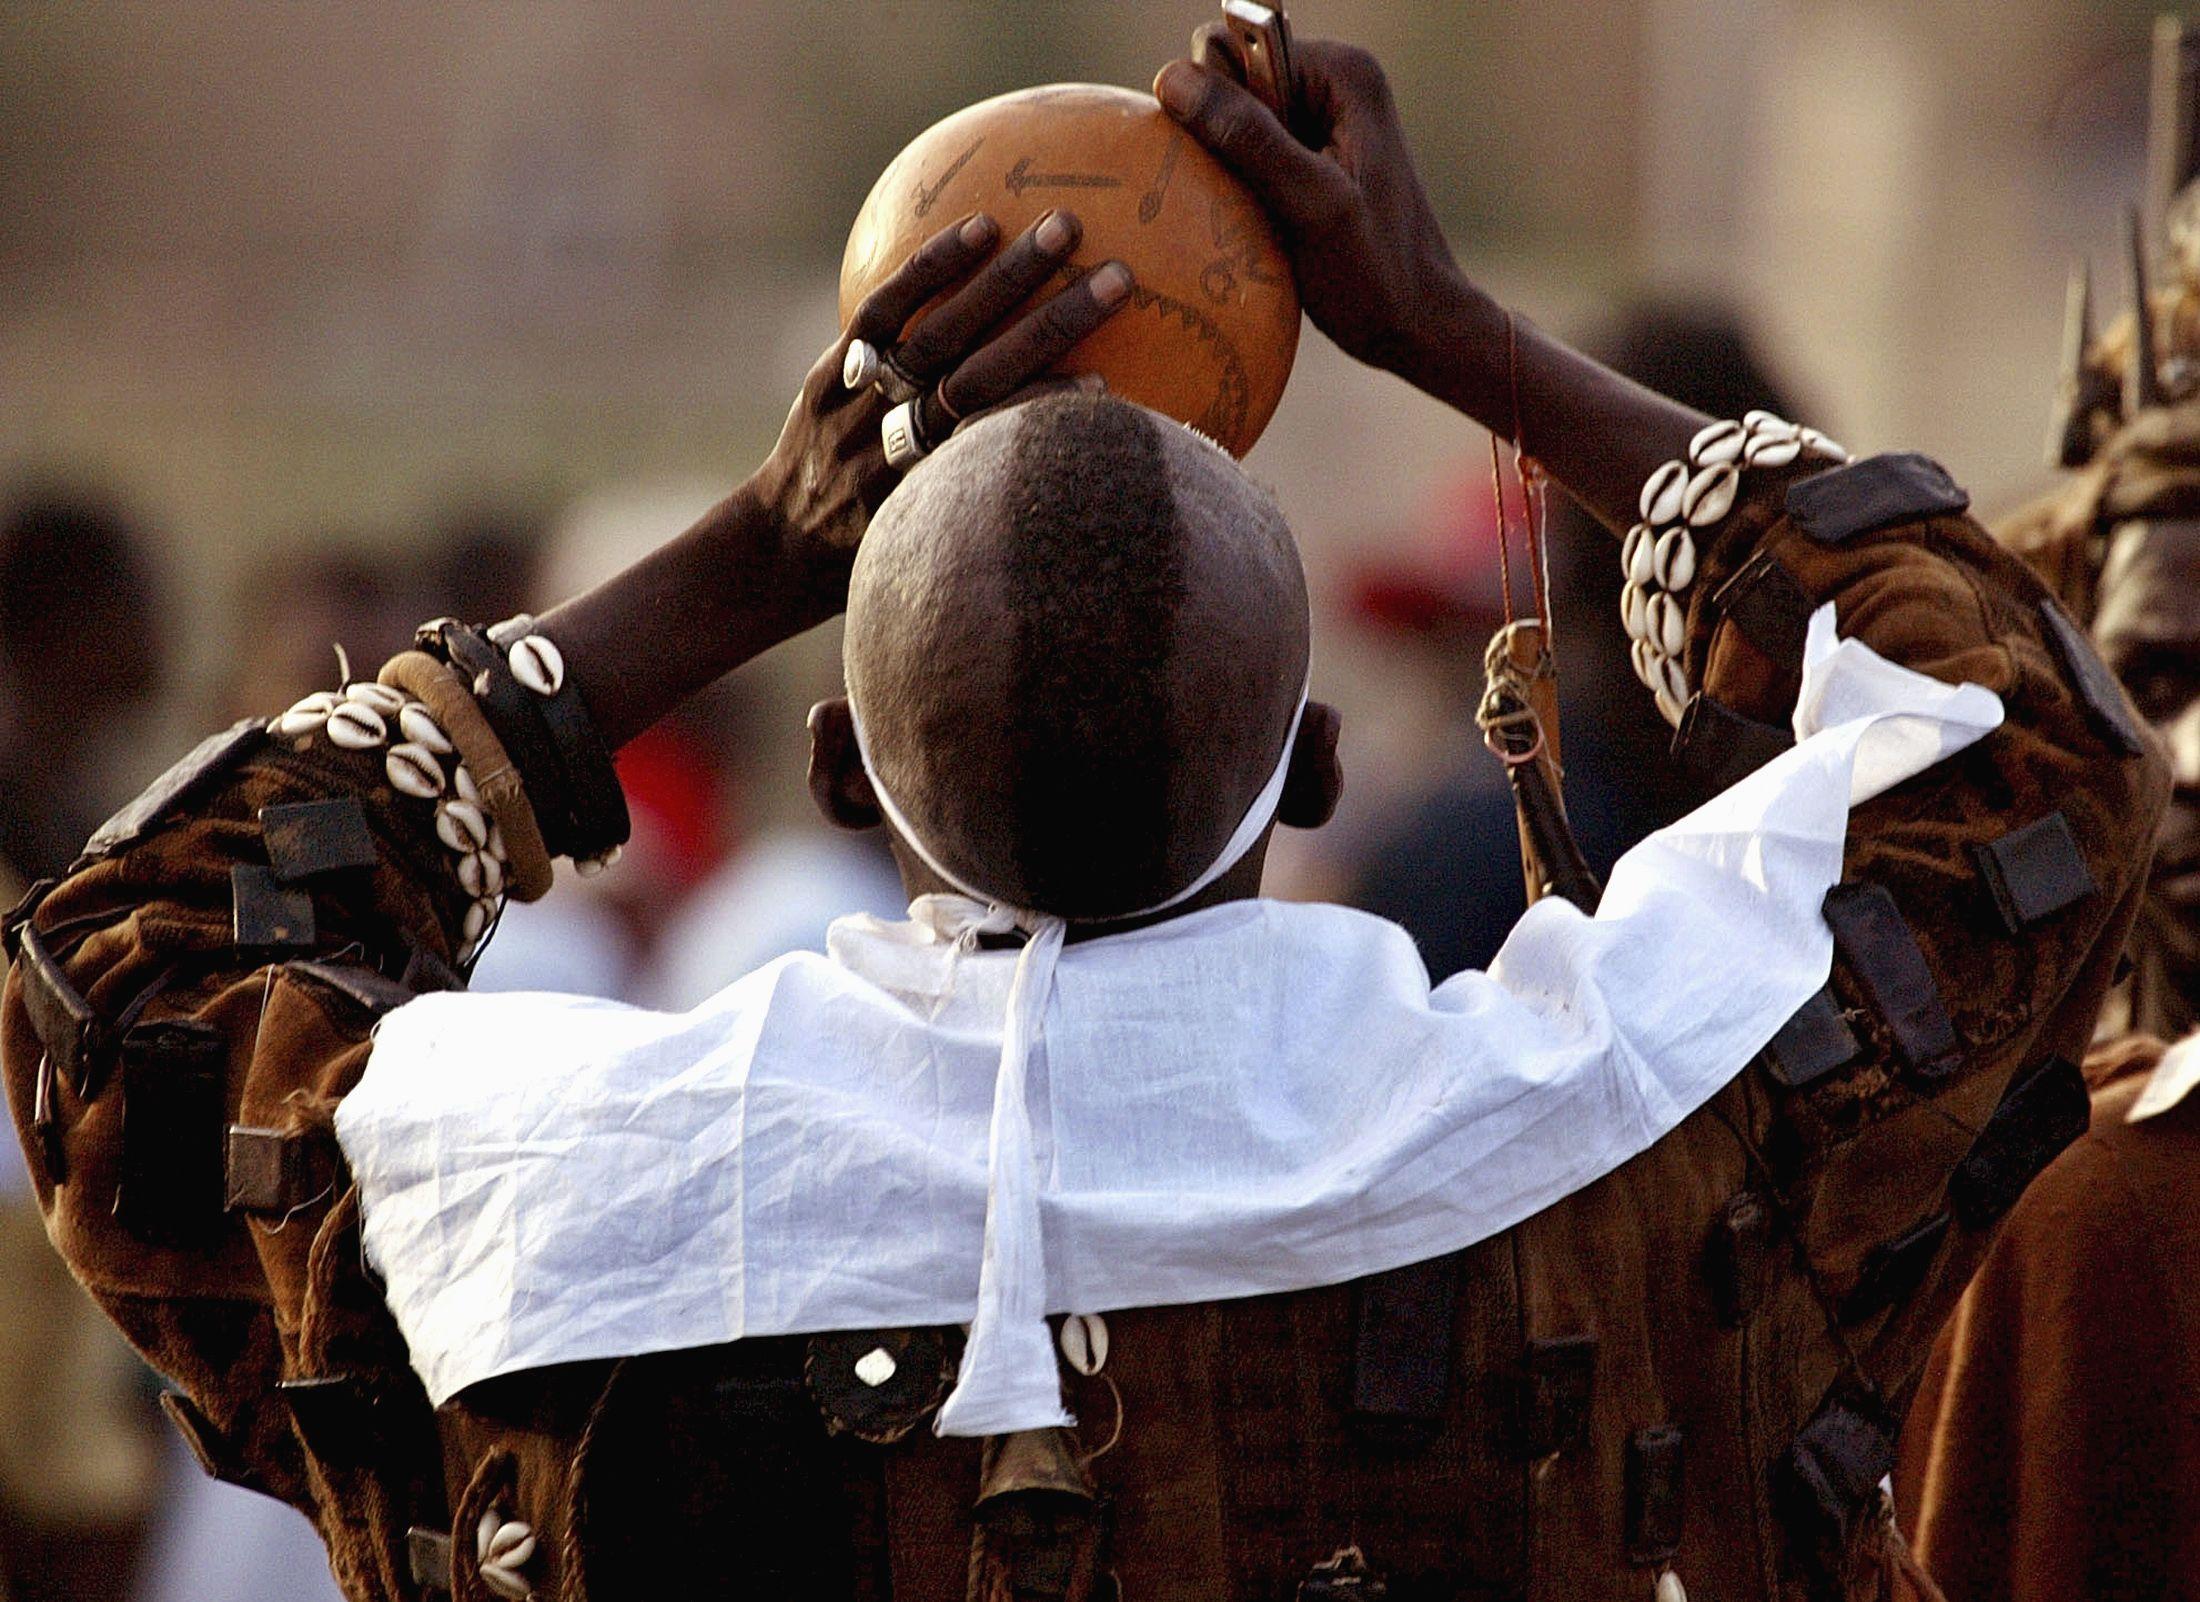 Traditional healer drinks animal blood